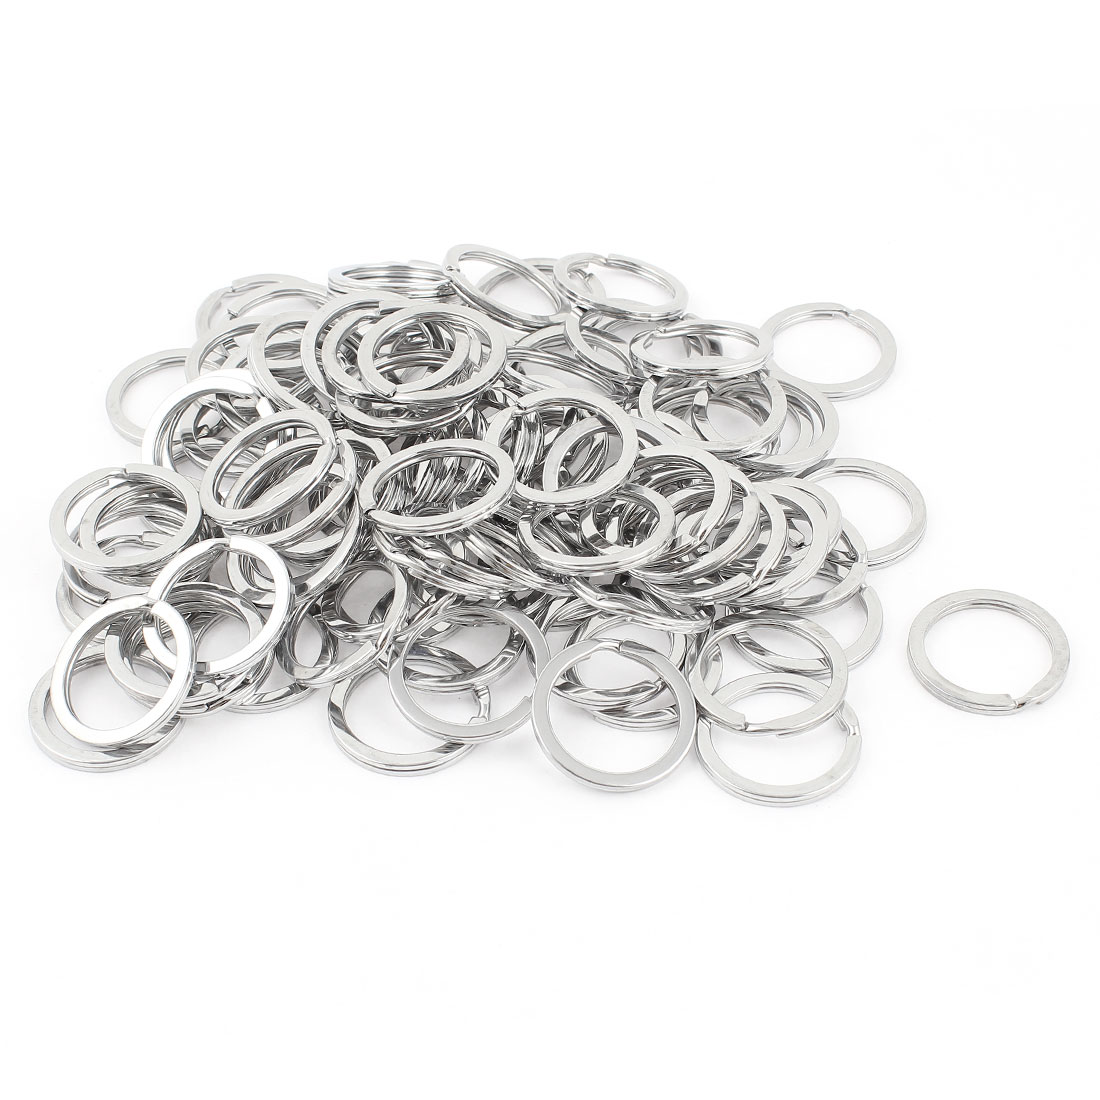 "100 Pcs Silver Tone 1"" Diameter Stainlelss Steel Split Key Rings Keychains"